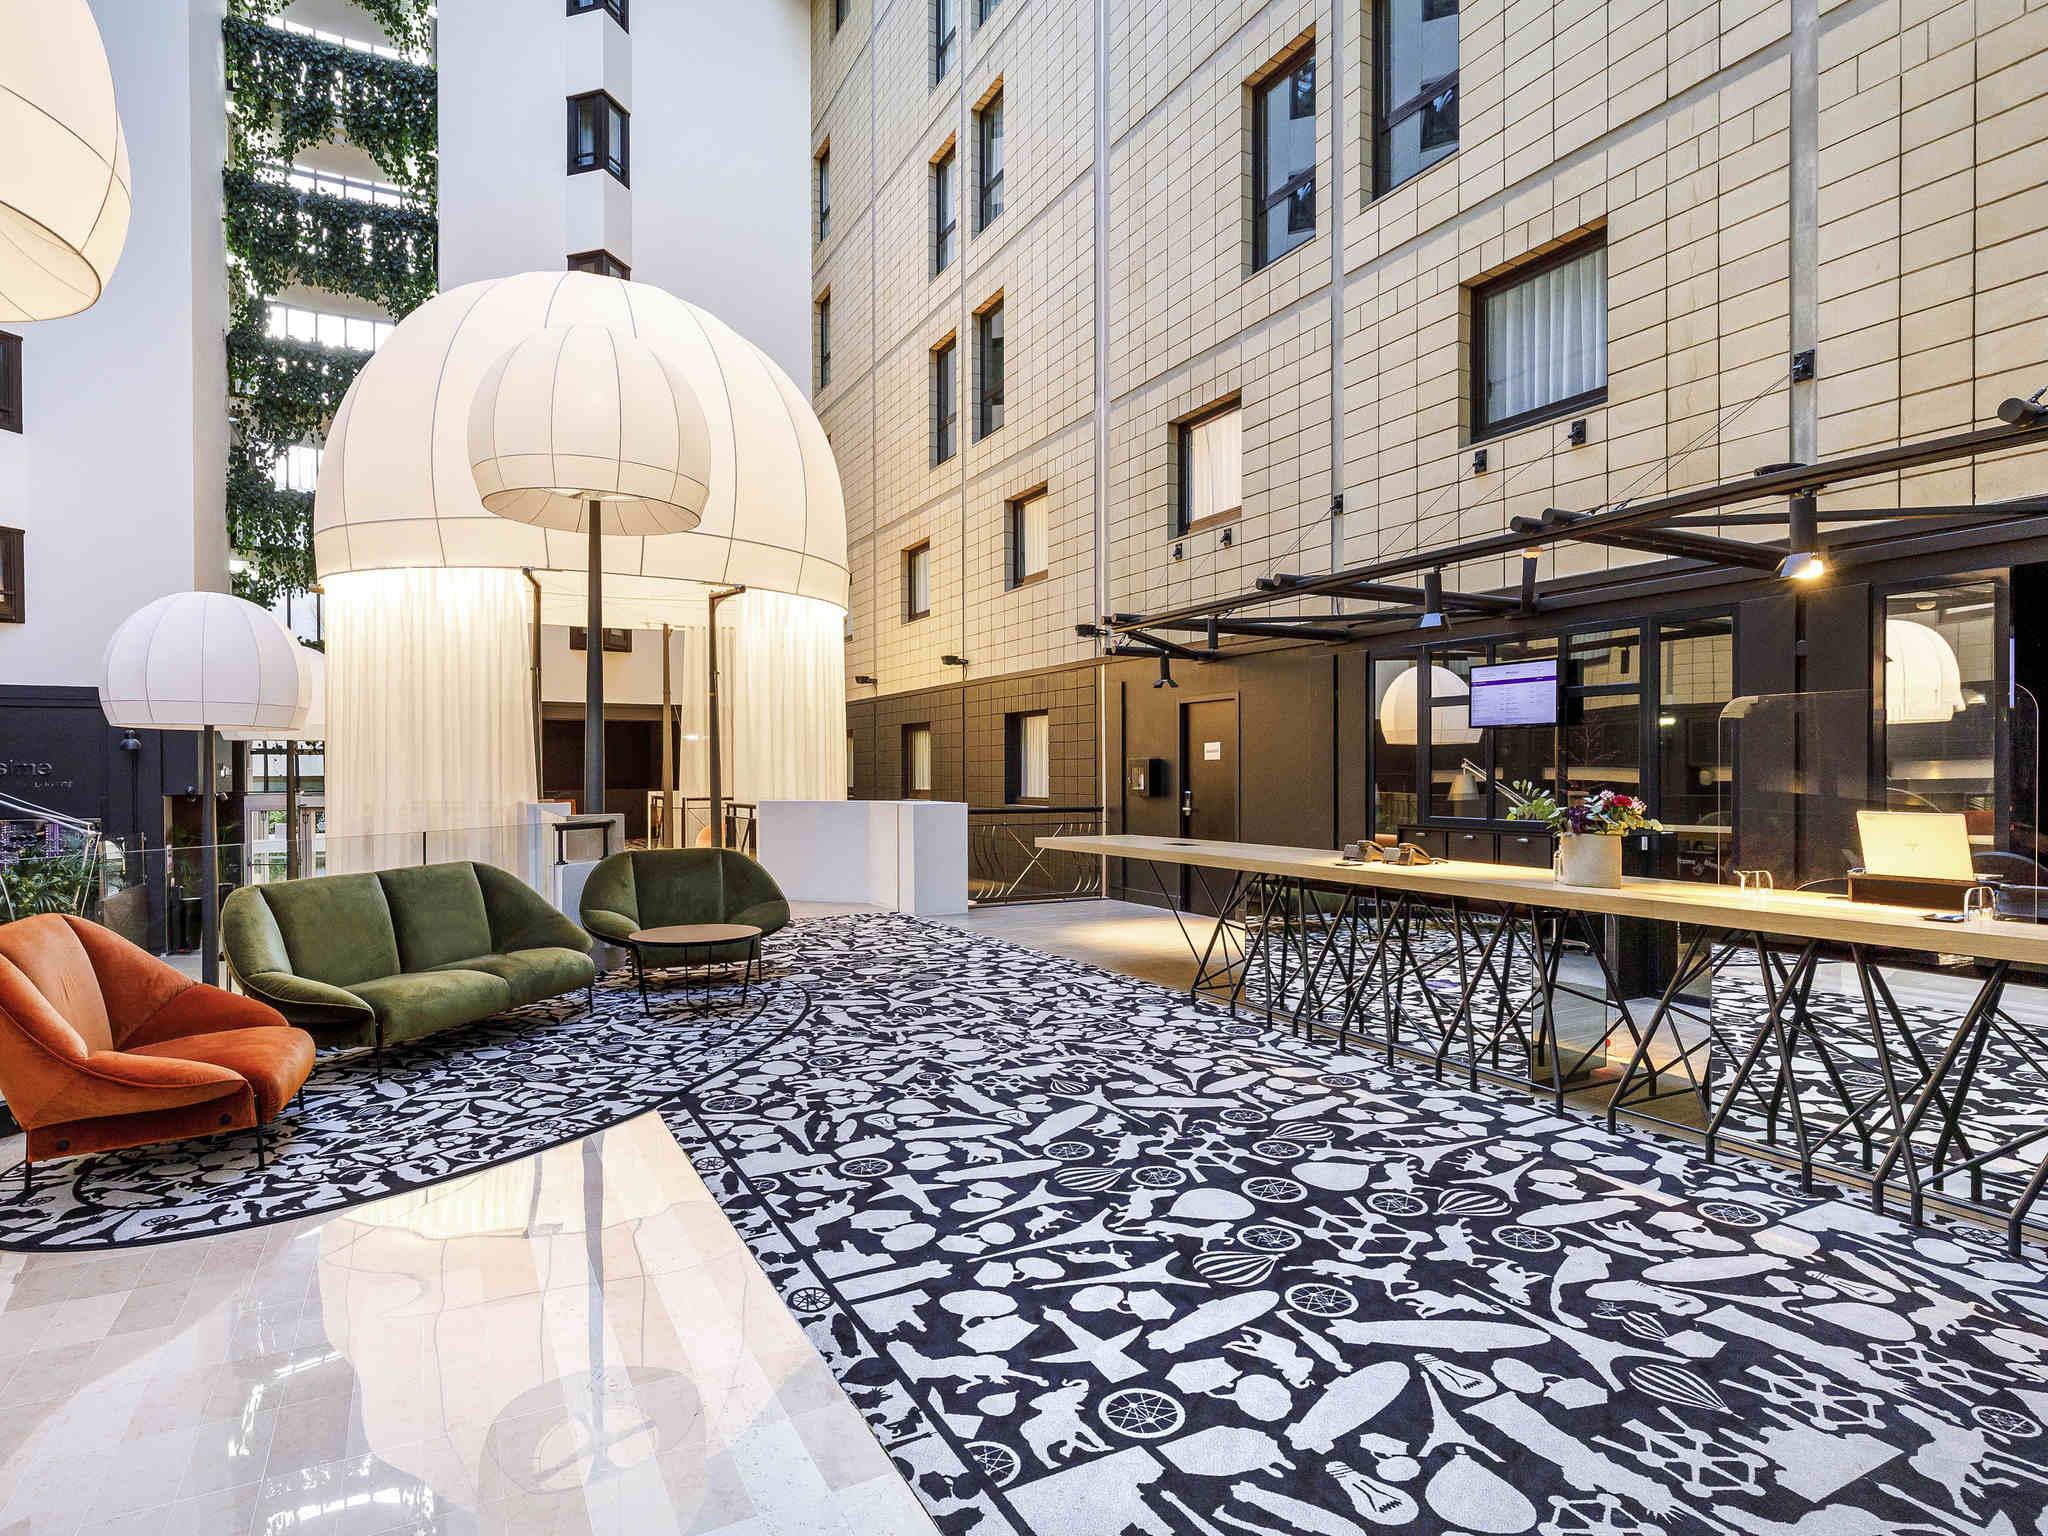 Hotel – Hotel Mercure Parijs Porte de Versailles Expo